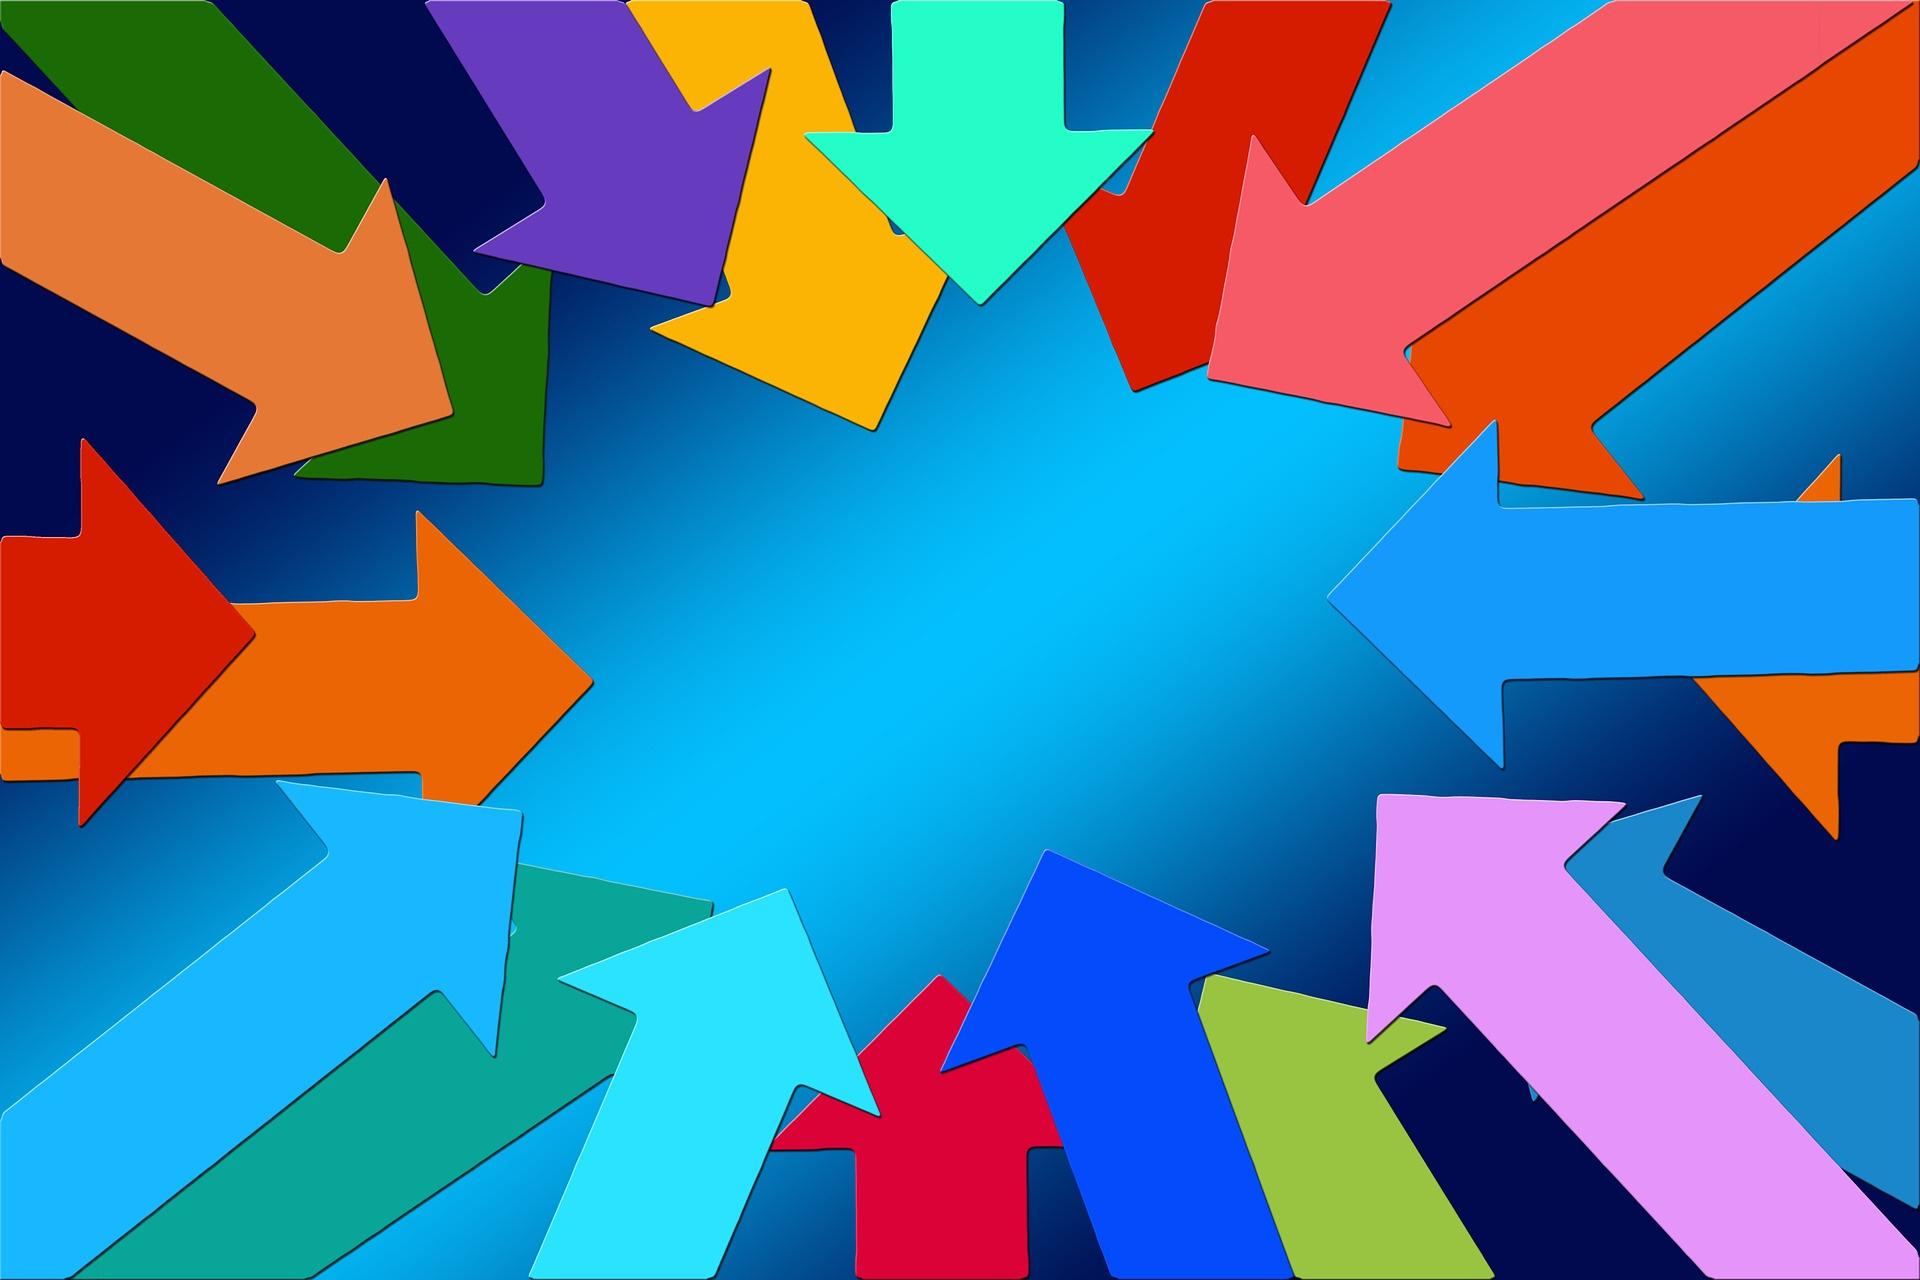 Les sites Hub sharepoint